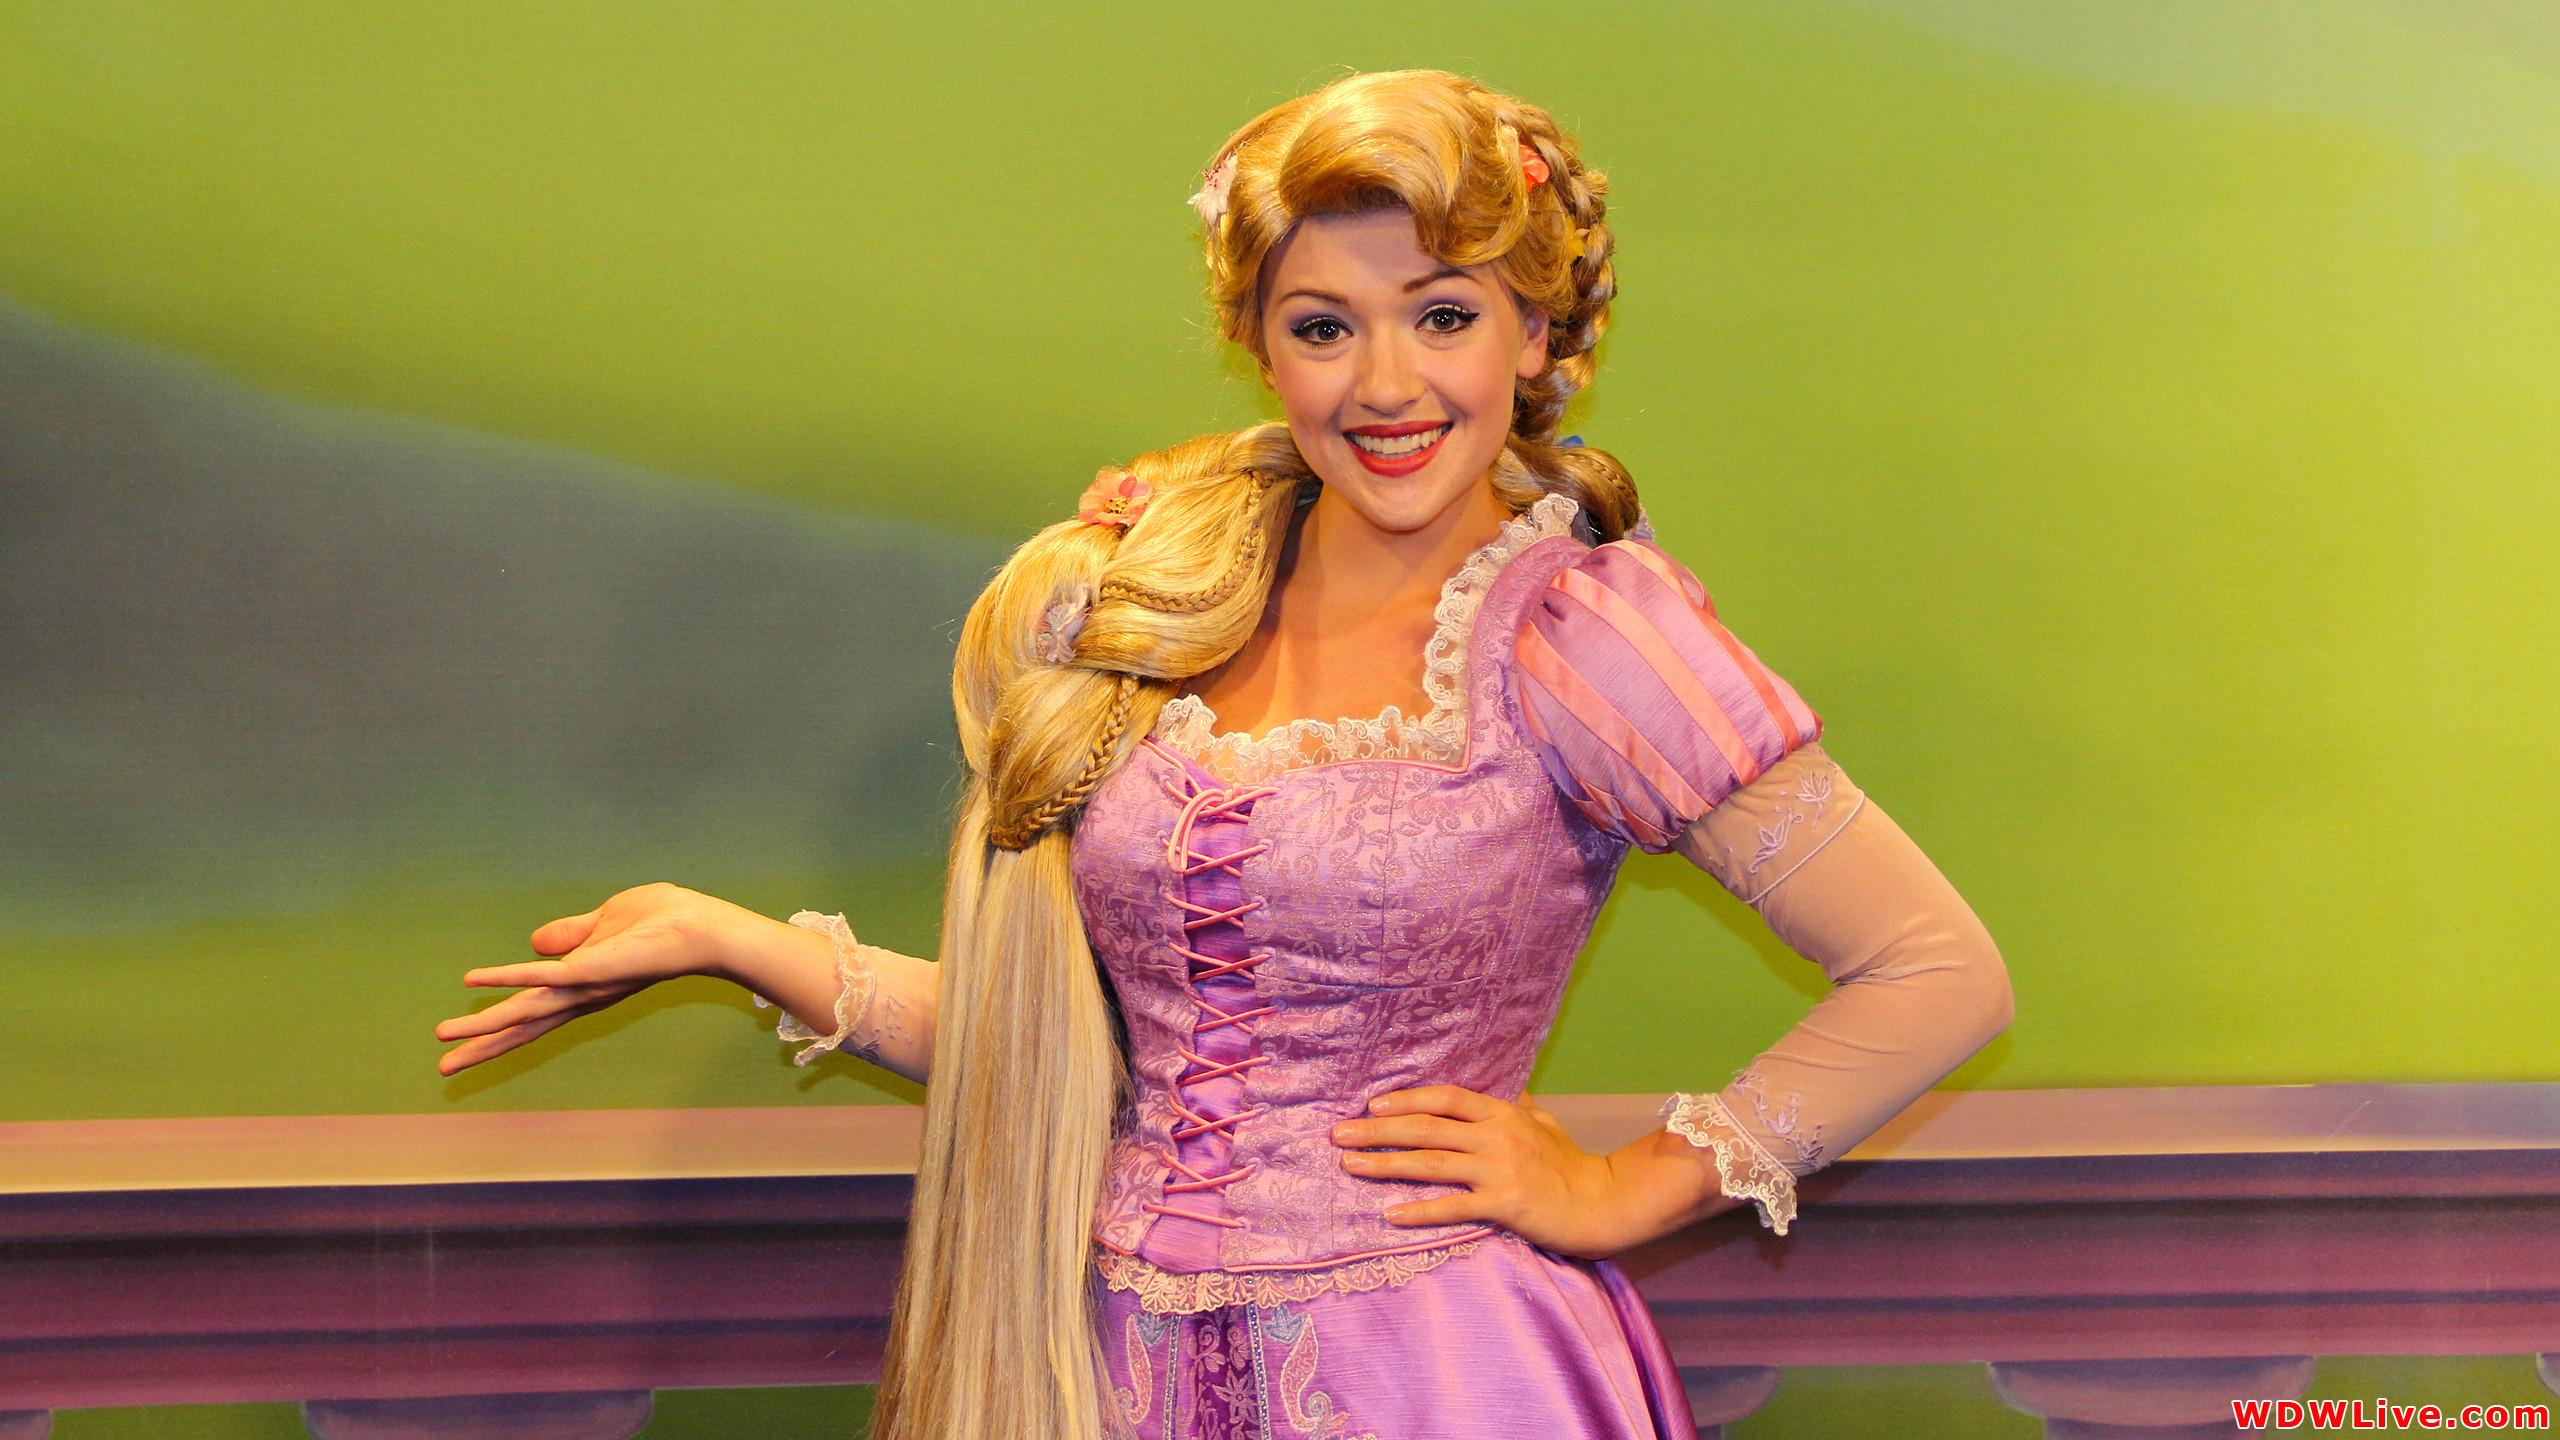 Rapunzel Wallpaper Hd 70 Images